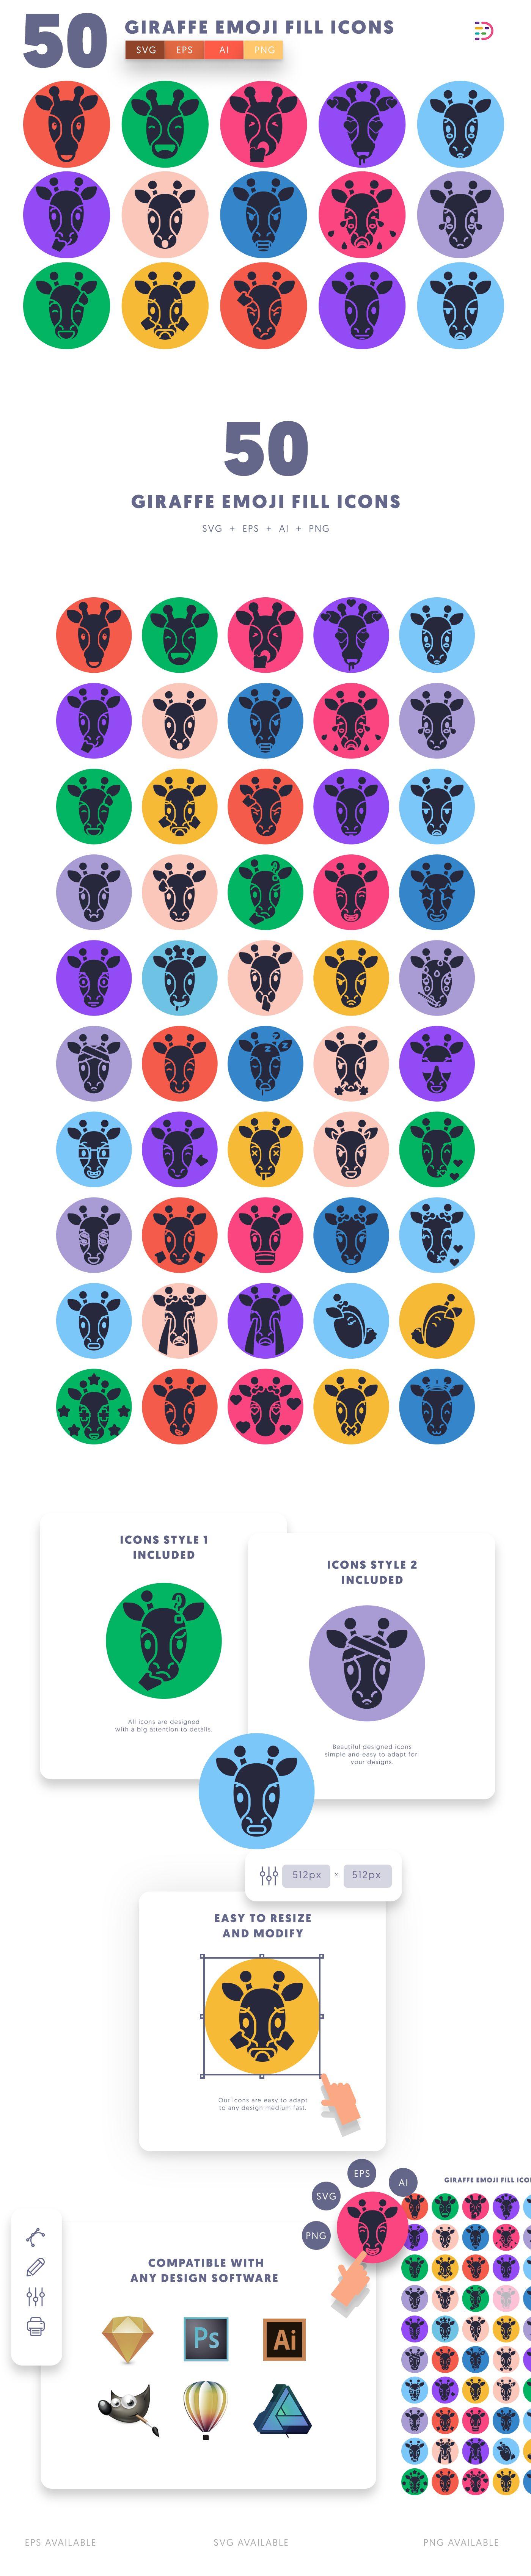 Giraffe Emoji Fill icons info graphic